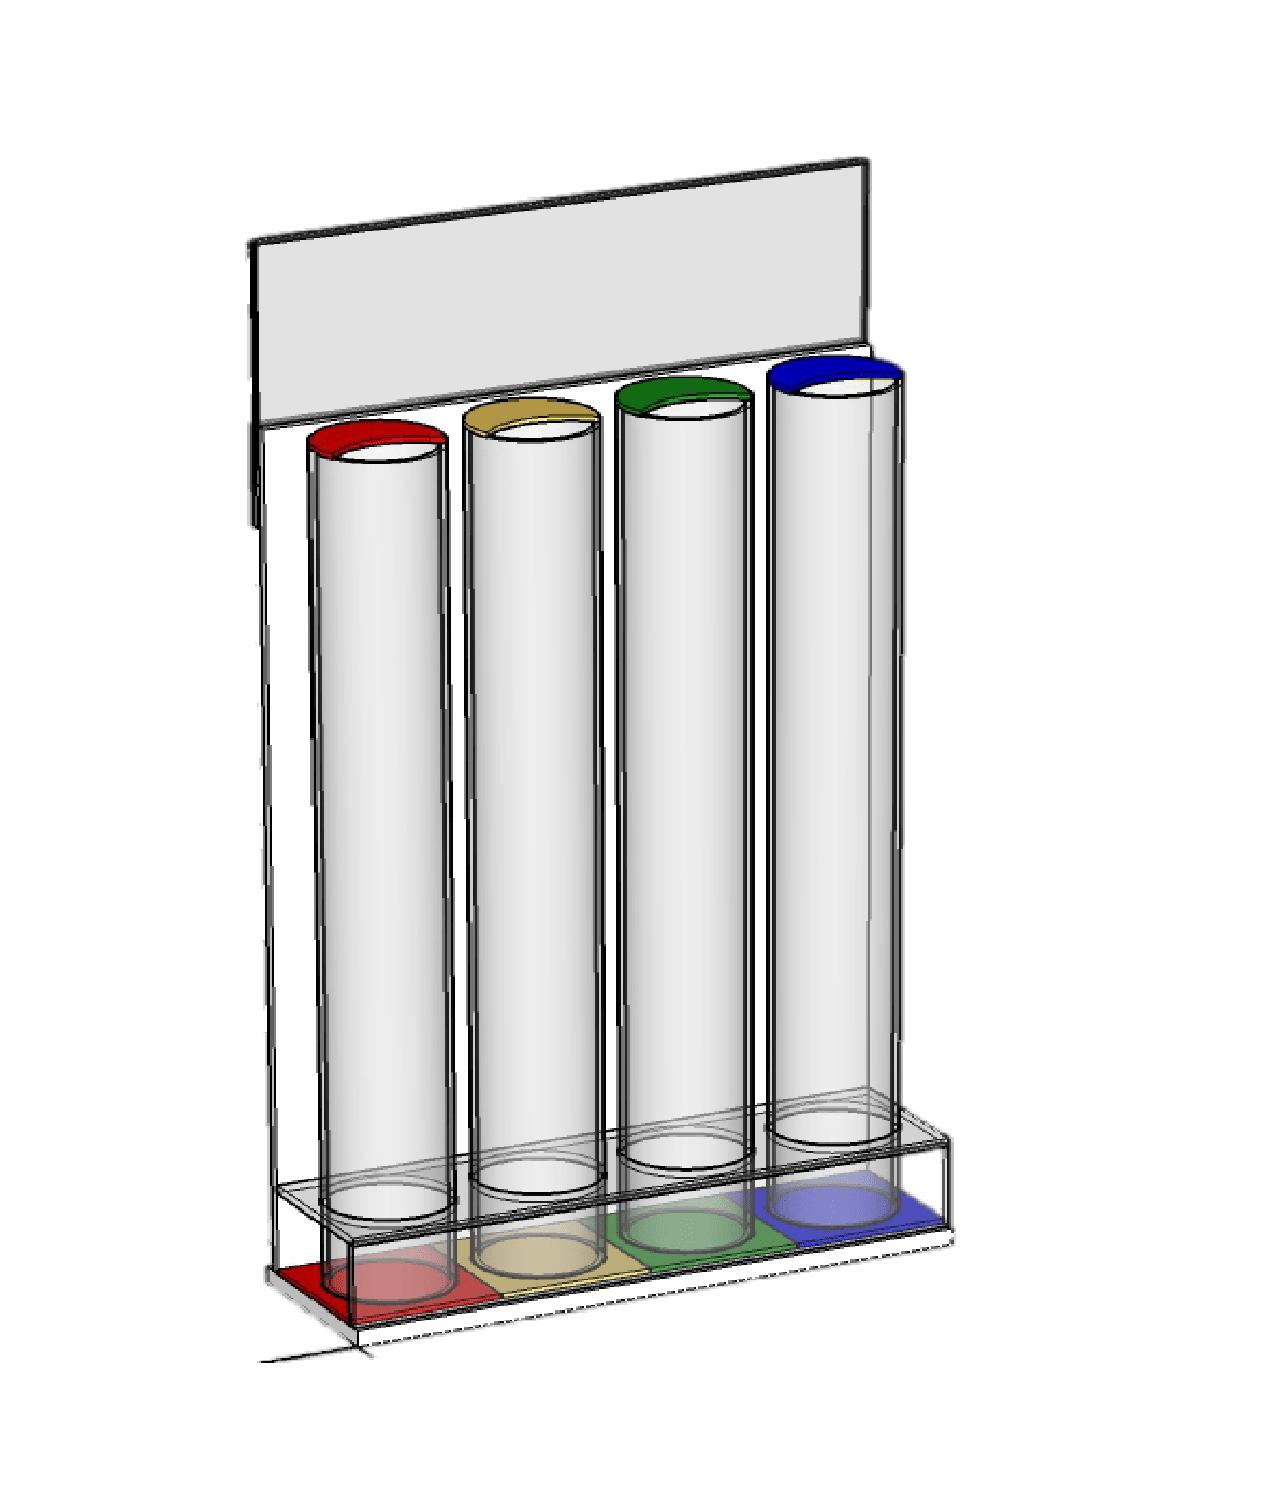 desktopcollector